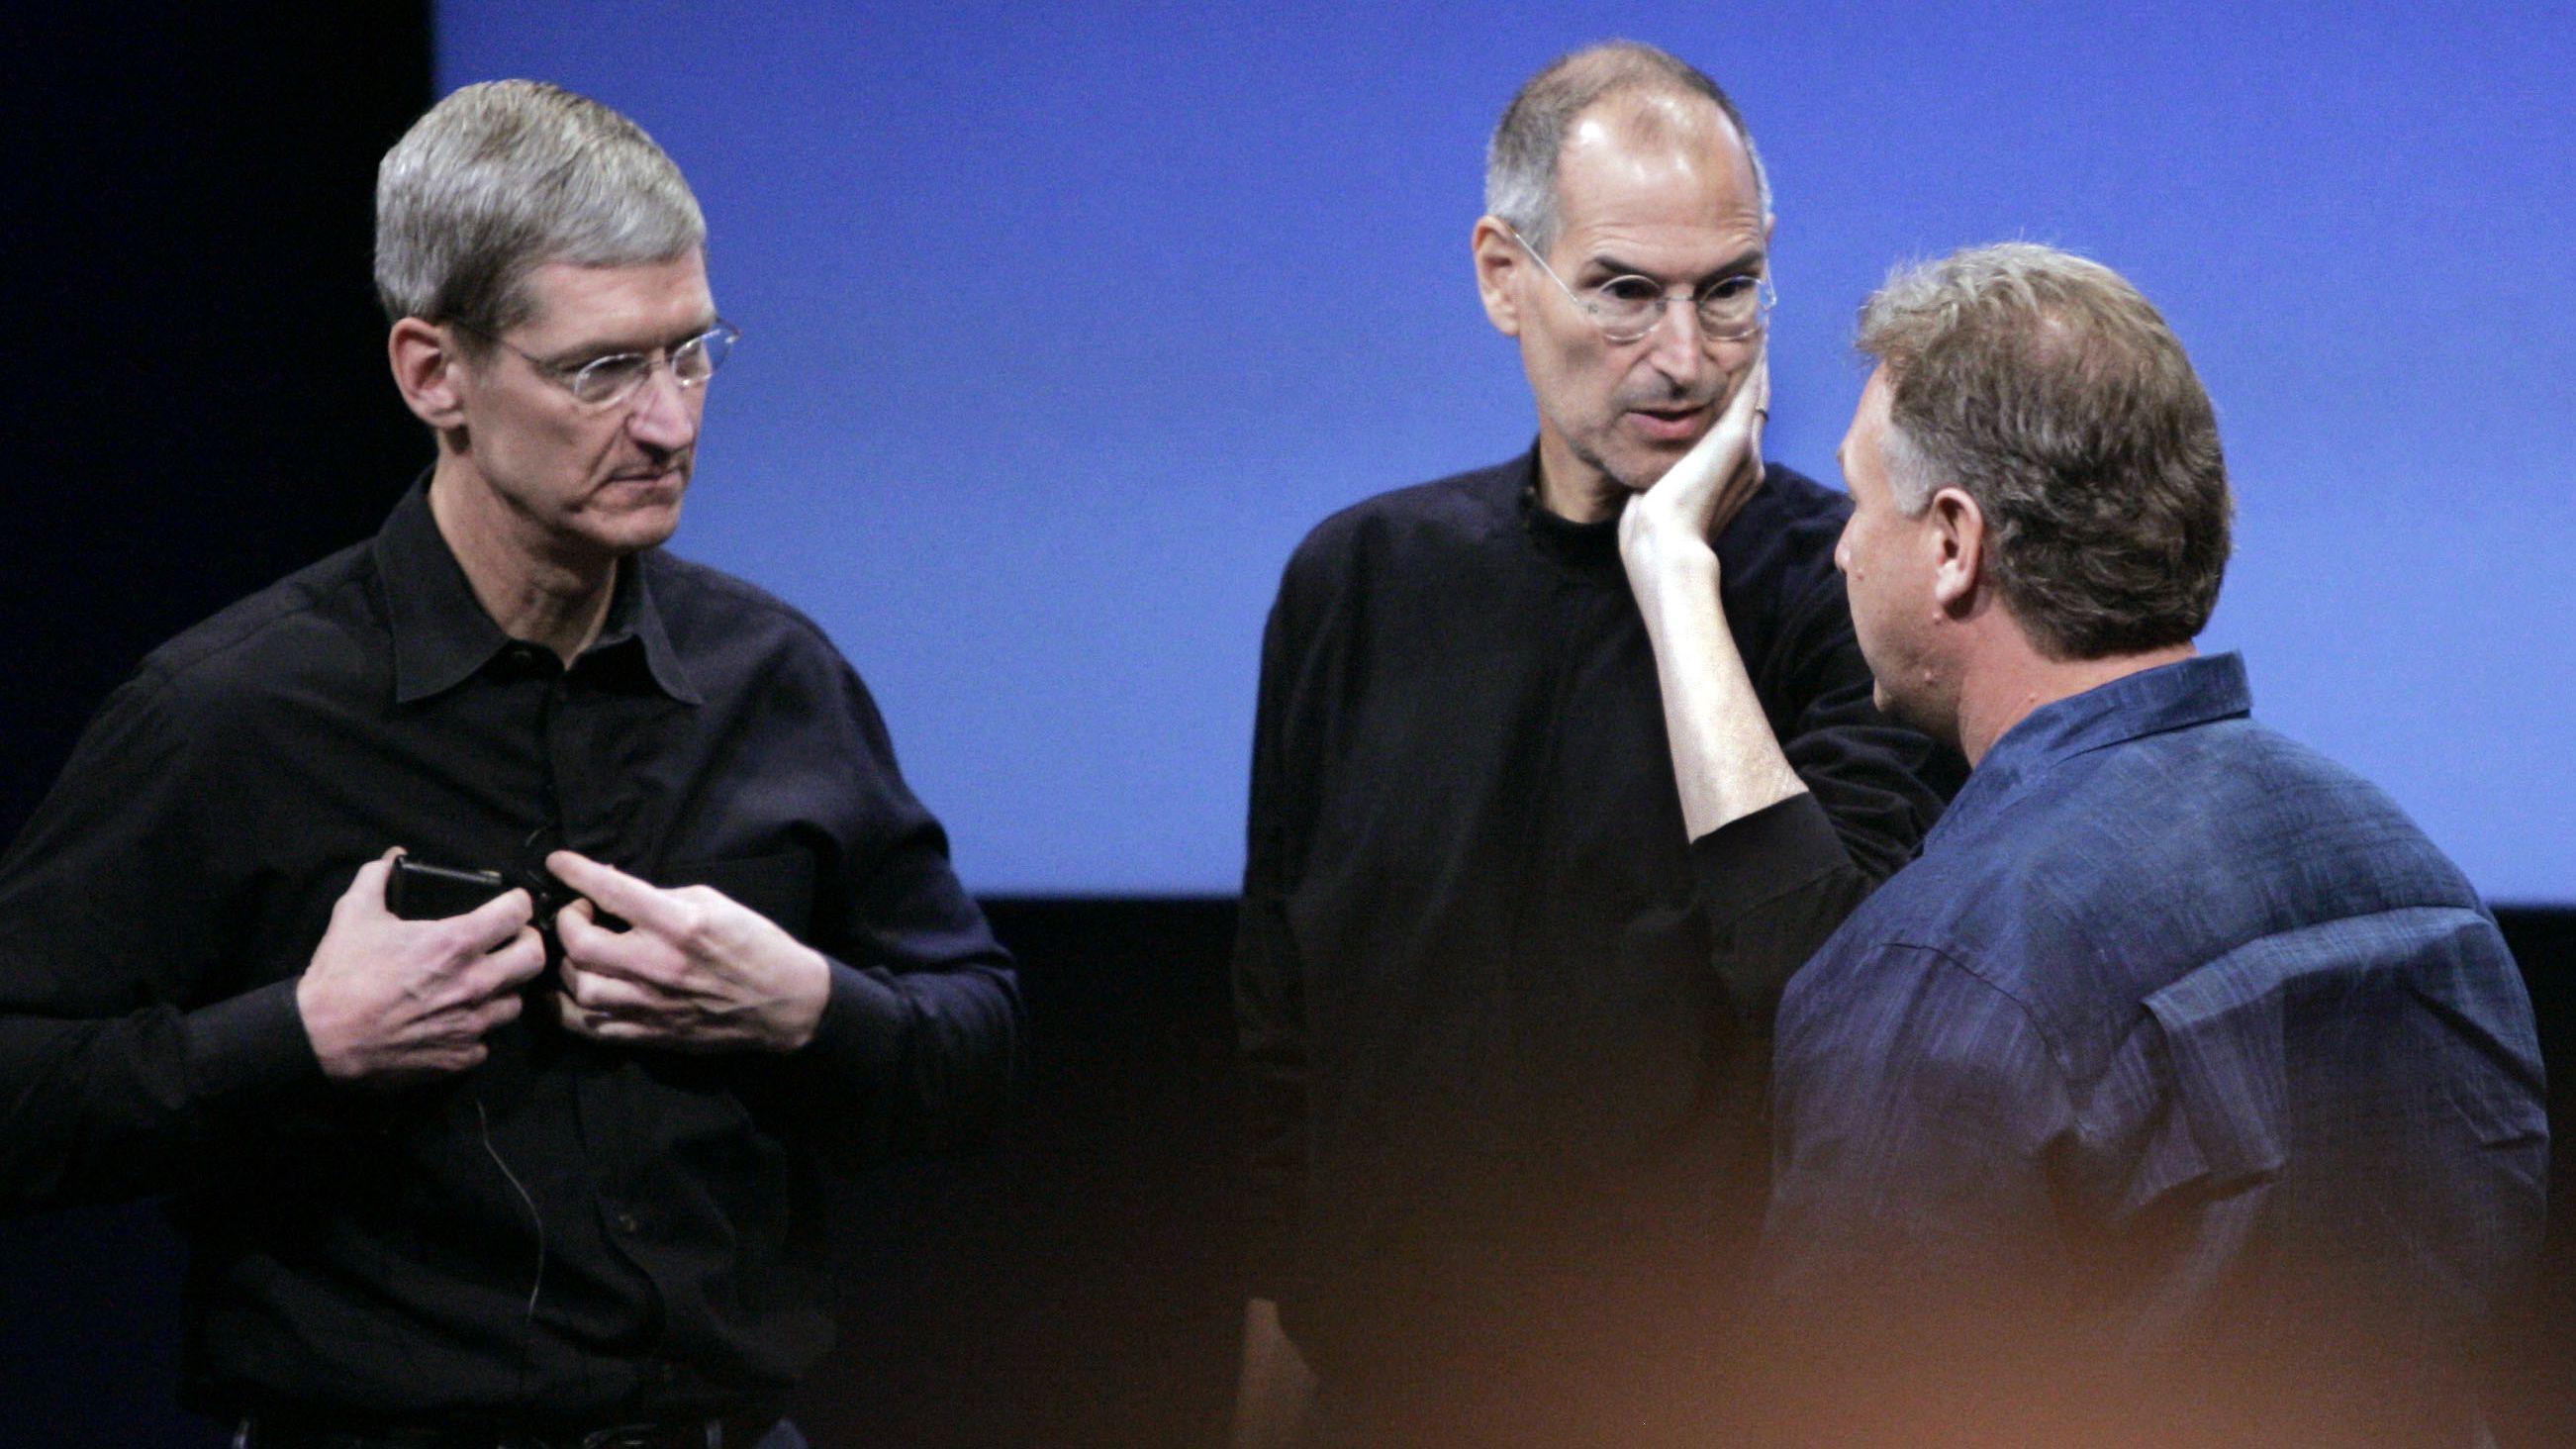 Tim Cook, Steve Jobs, and Phil Schiller